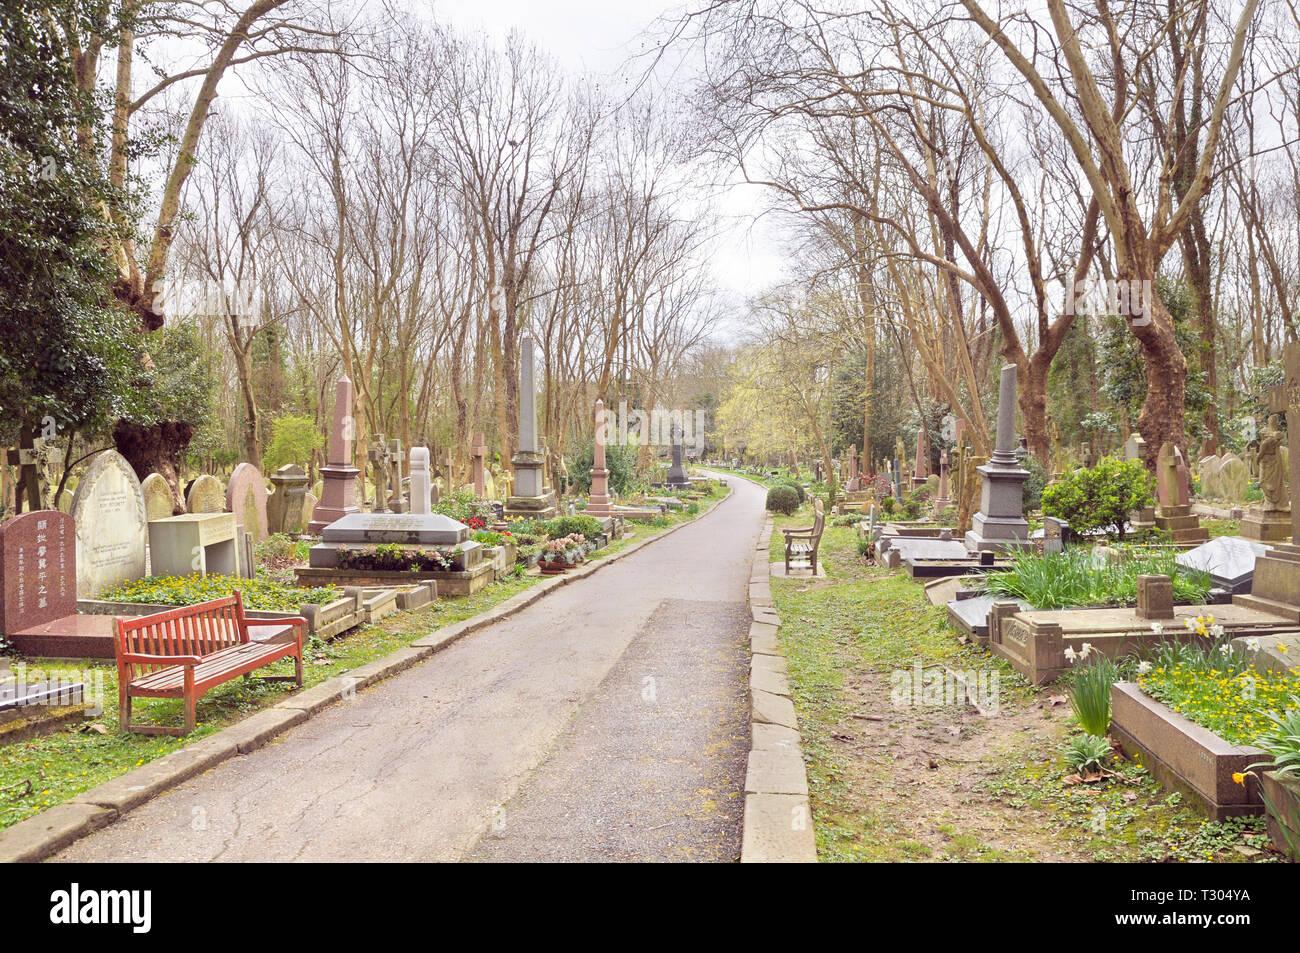 Highgate Cemetery, London, England, UK - Stock Image